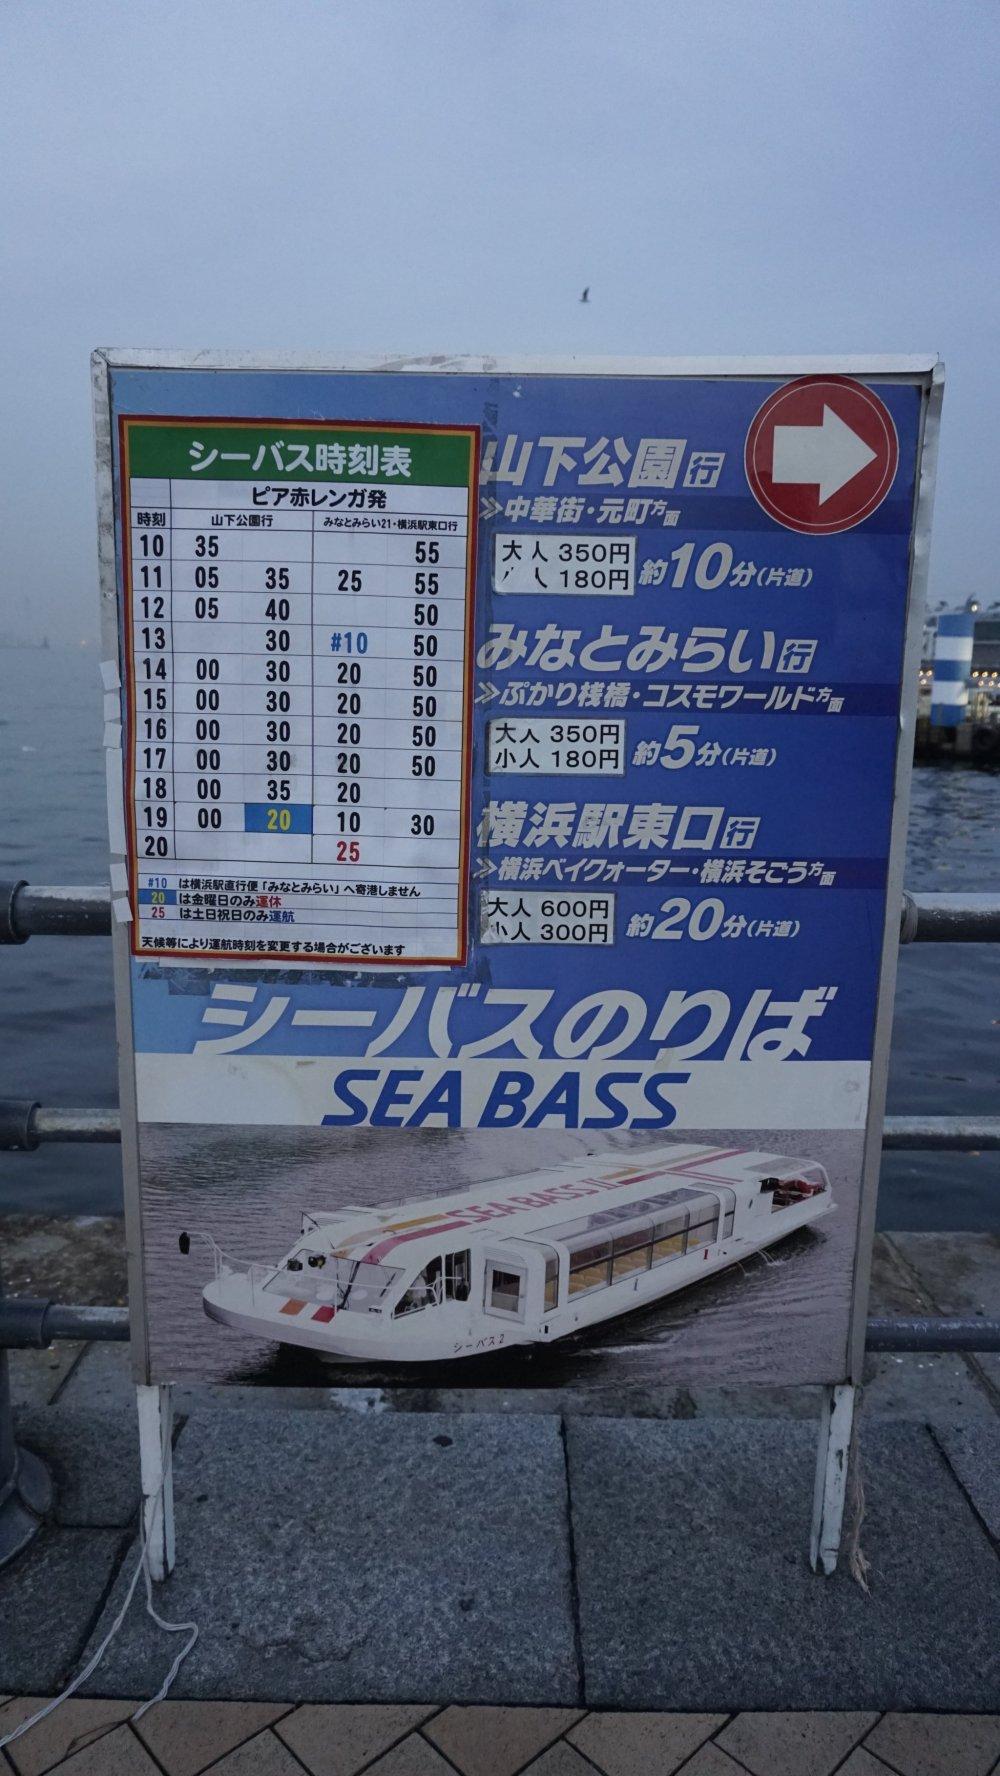 Sea Bass information board